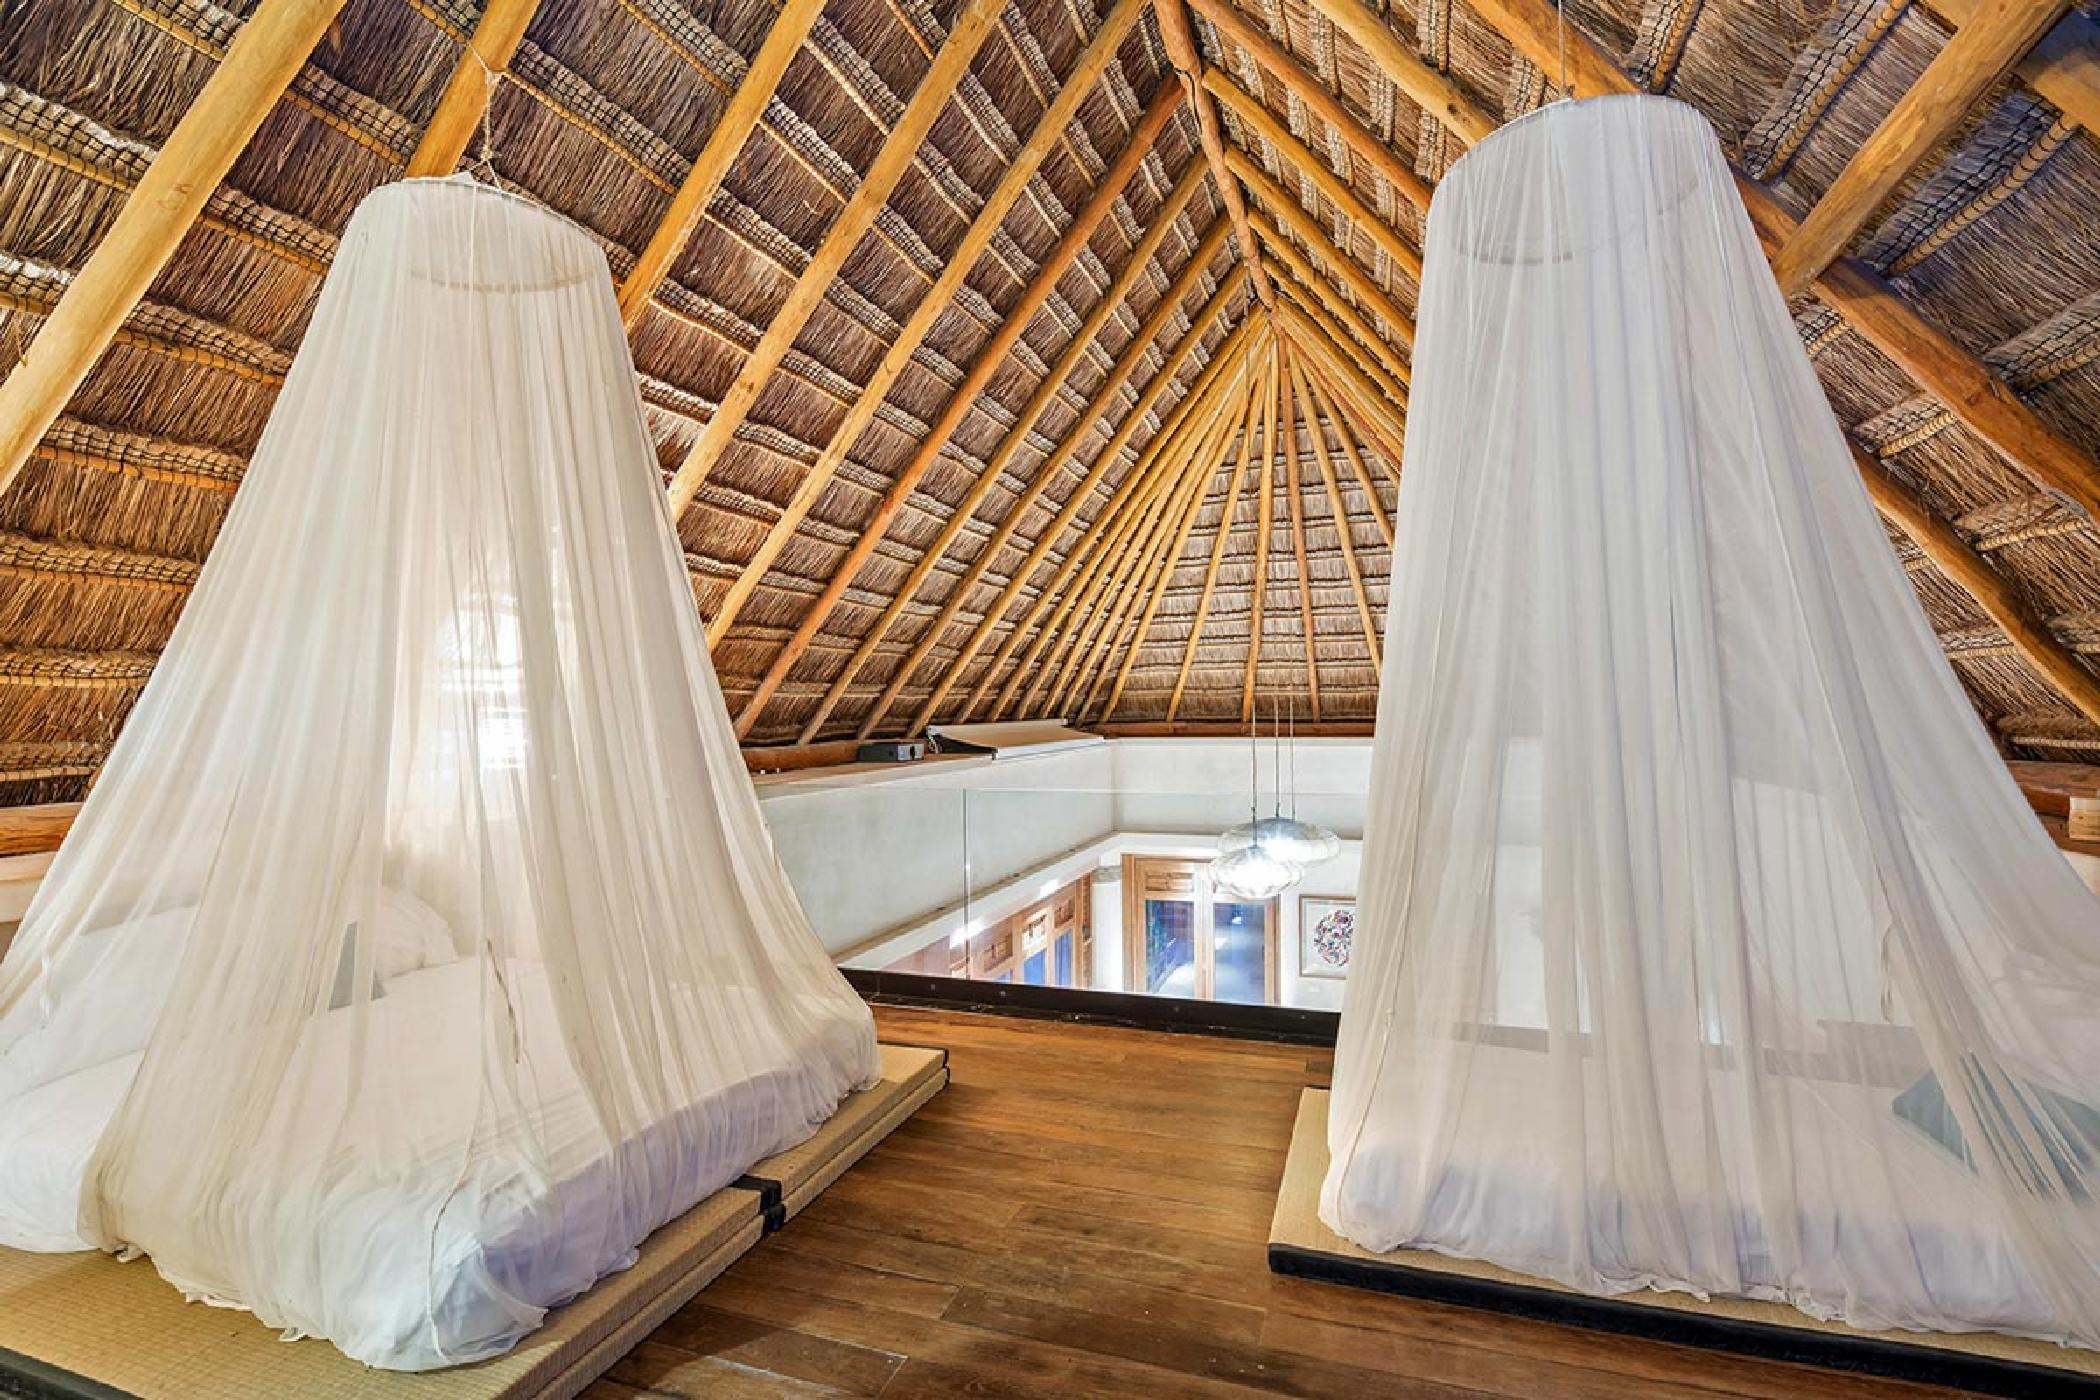 Maya_Luxe_Riviera_Maya_Luxury_Villas_Experiences_Sian_Kaan_Tulum_4_Bedrooms_Casa_Cantarena_24.jpg